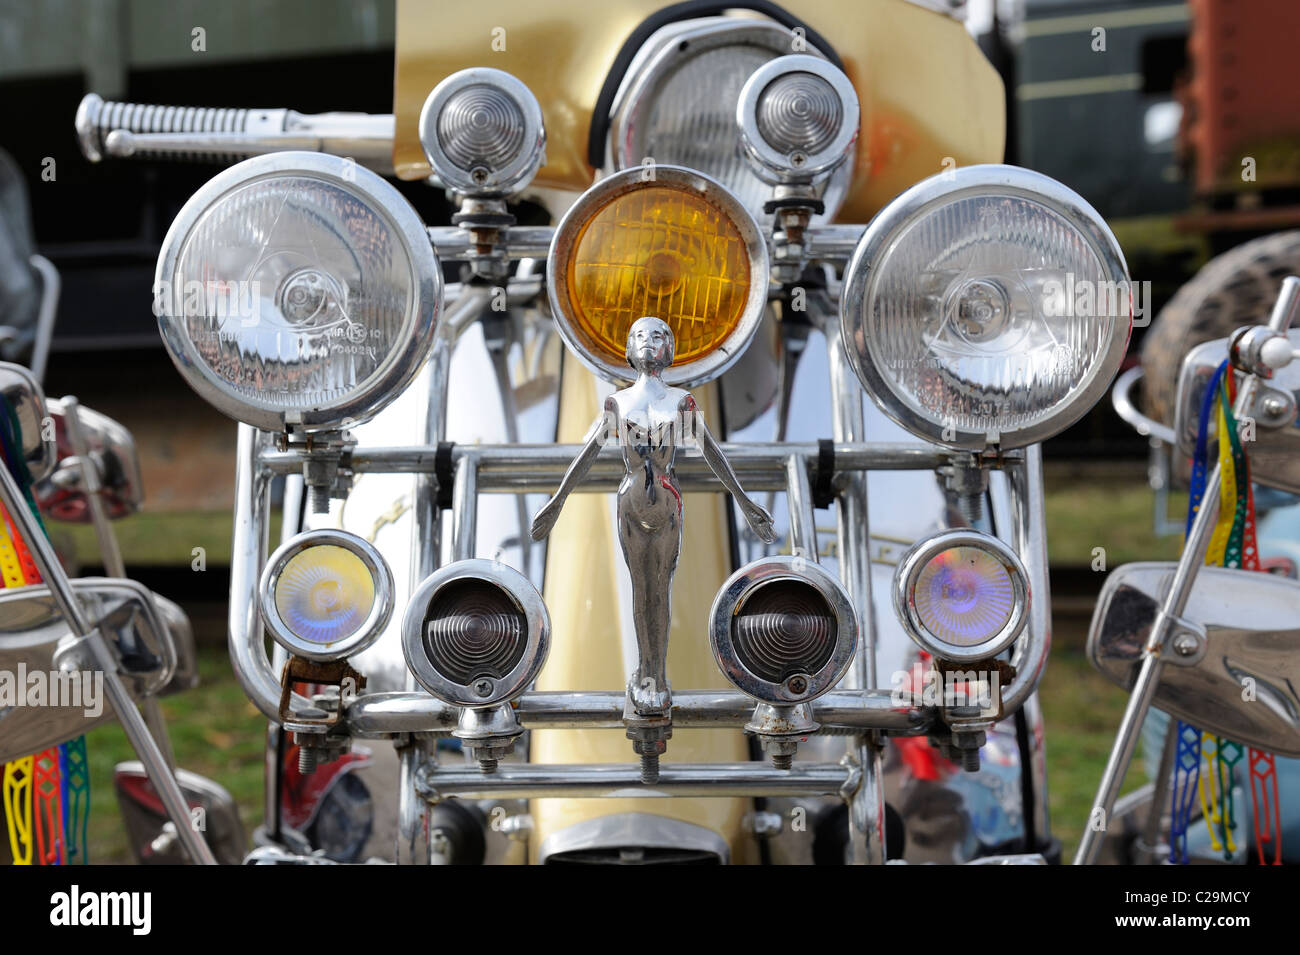 lambretta scooter headlamps england uk - Stock Image